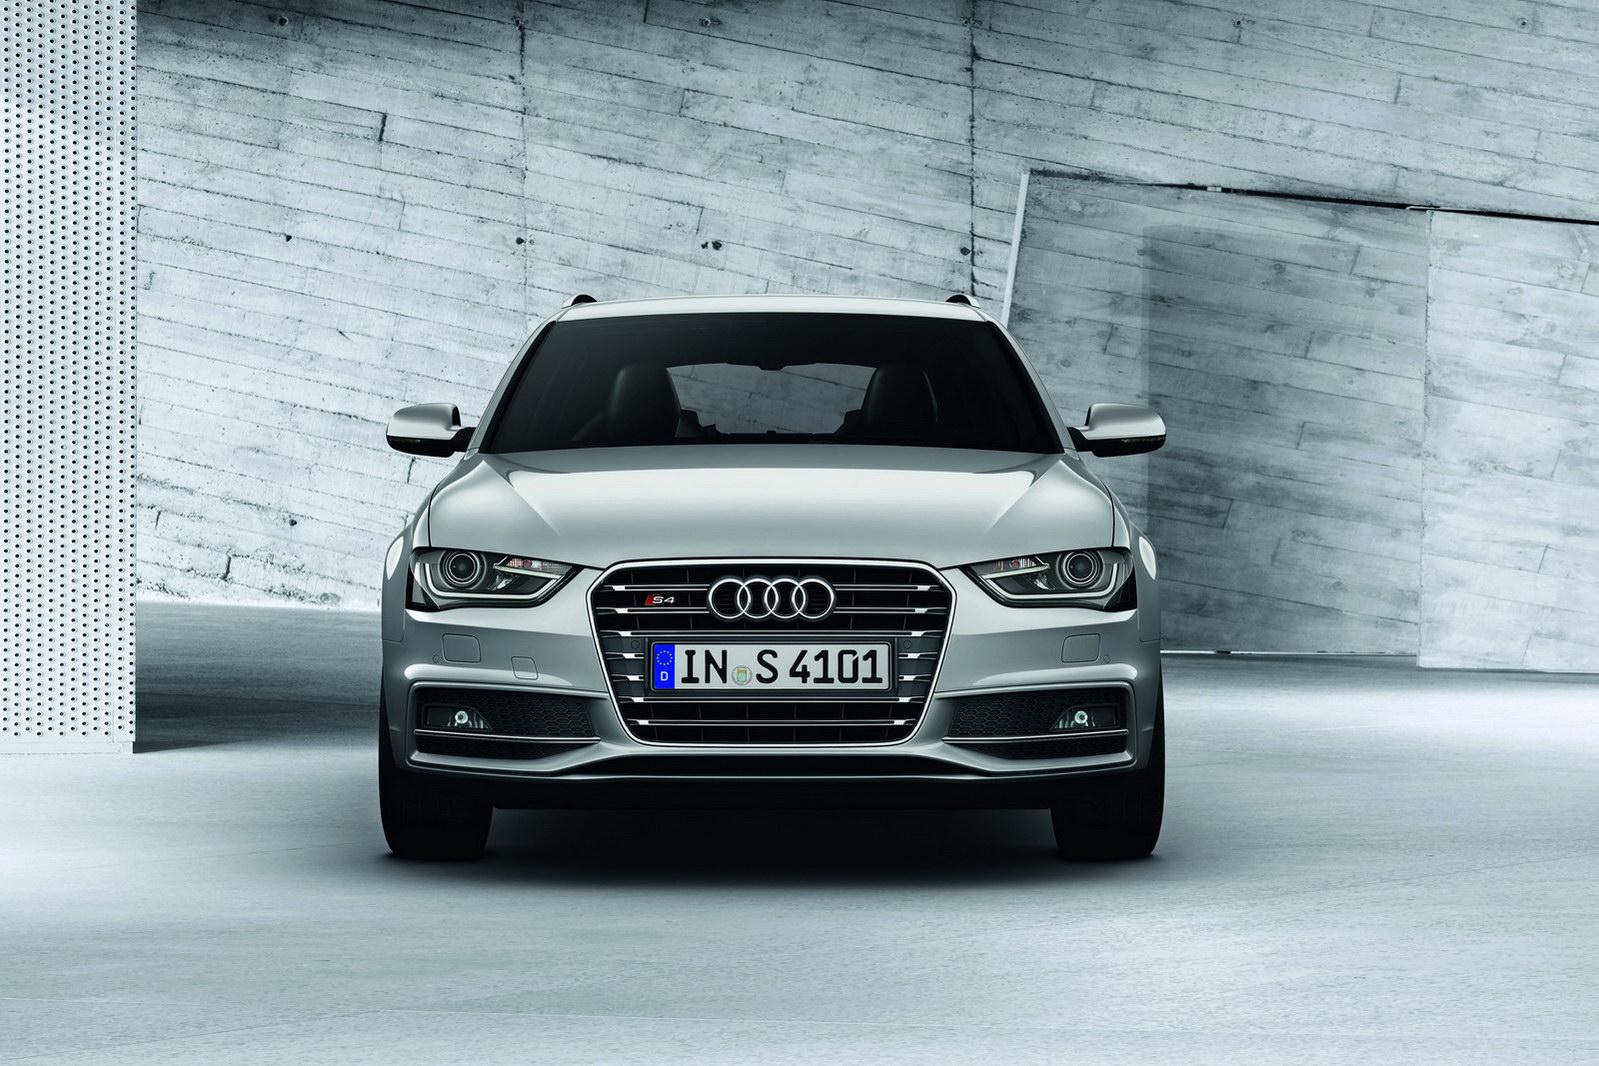 Audi S4 Le Bon Coin Land Rover Range Sport Sdv Hse Dr Auto U Audi Rs Sedan October Autogespot